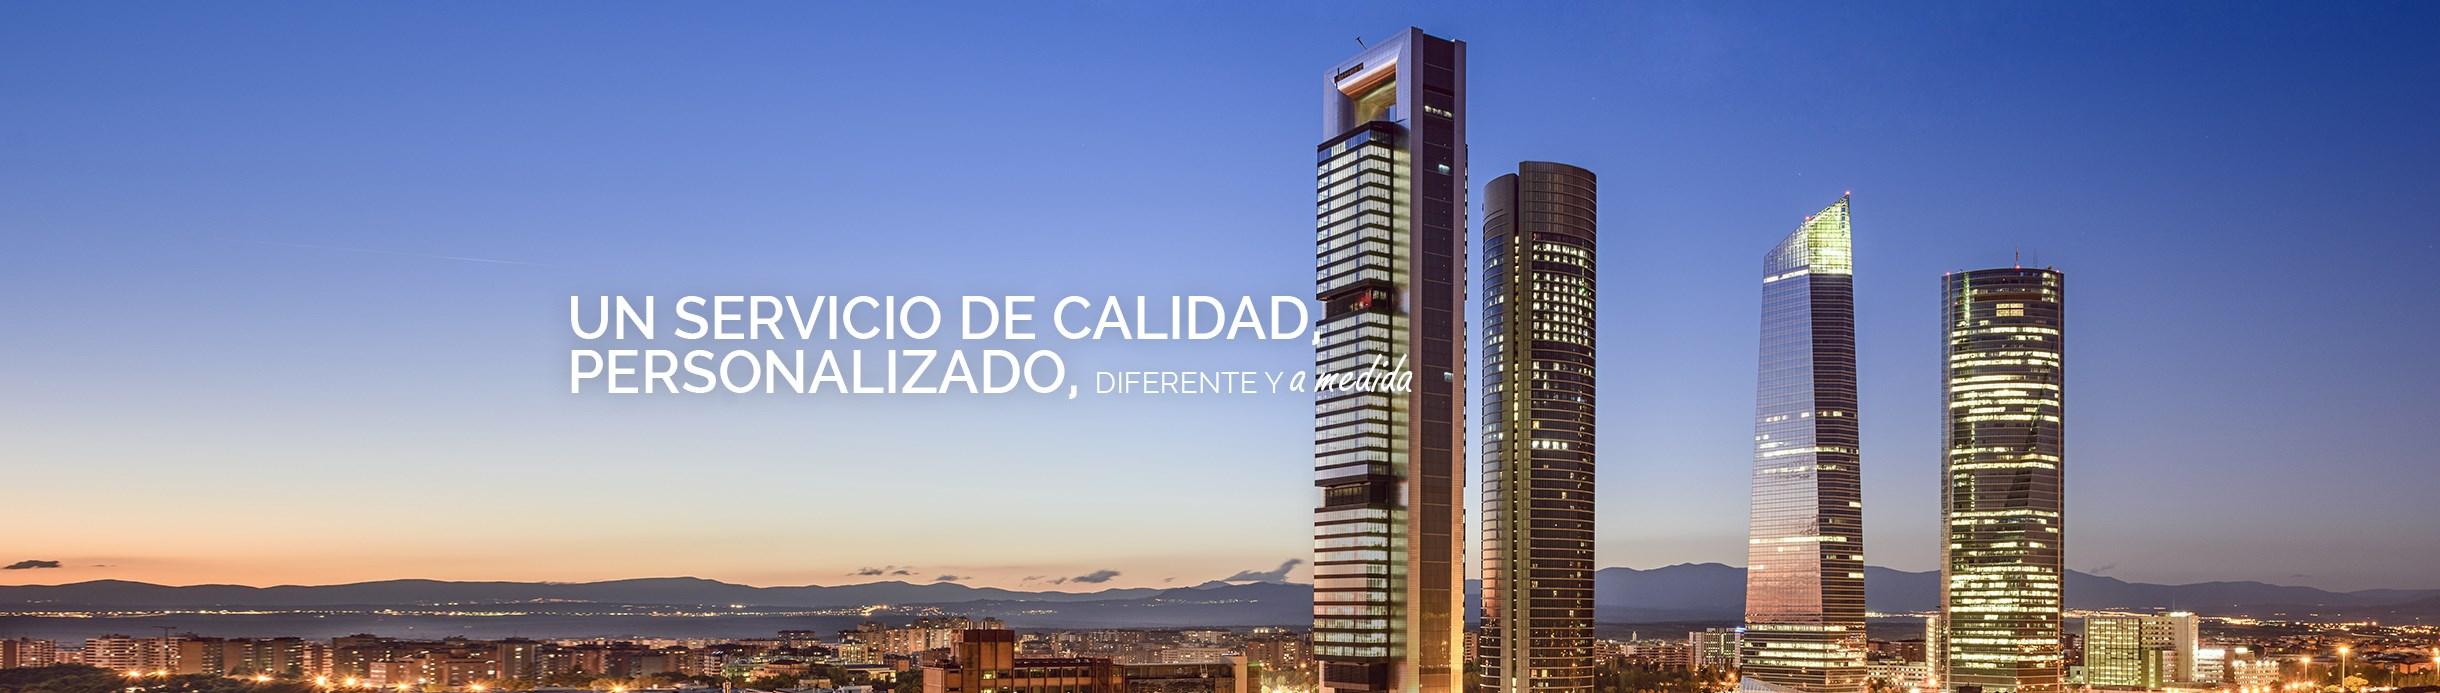 Banners_espanol